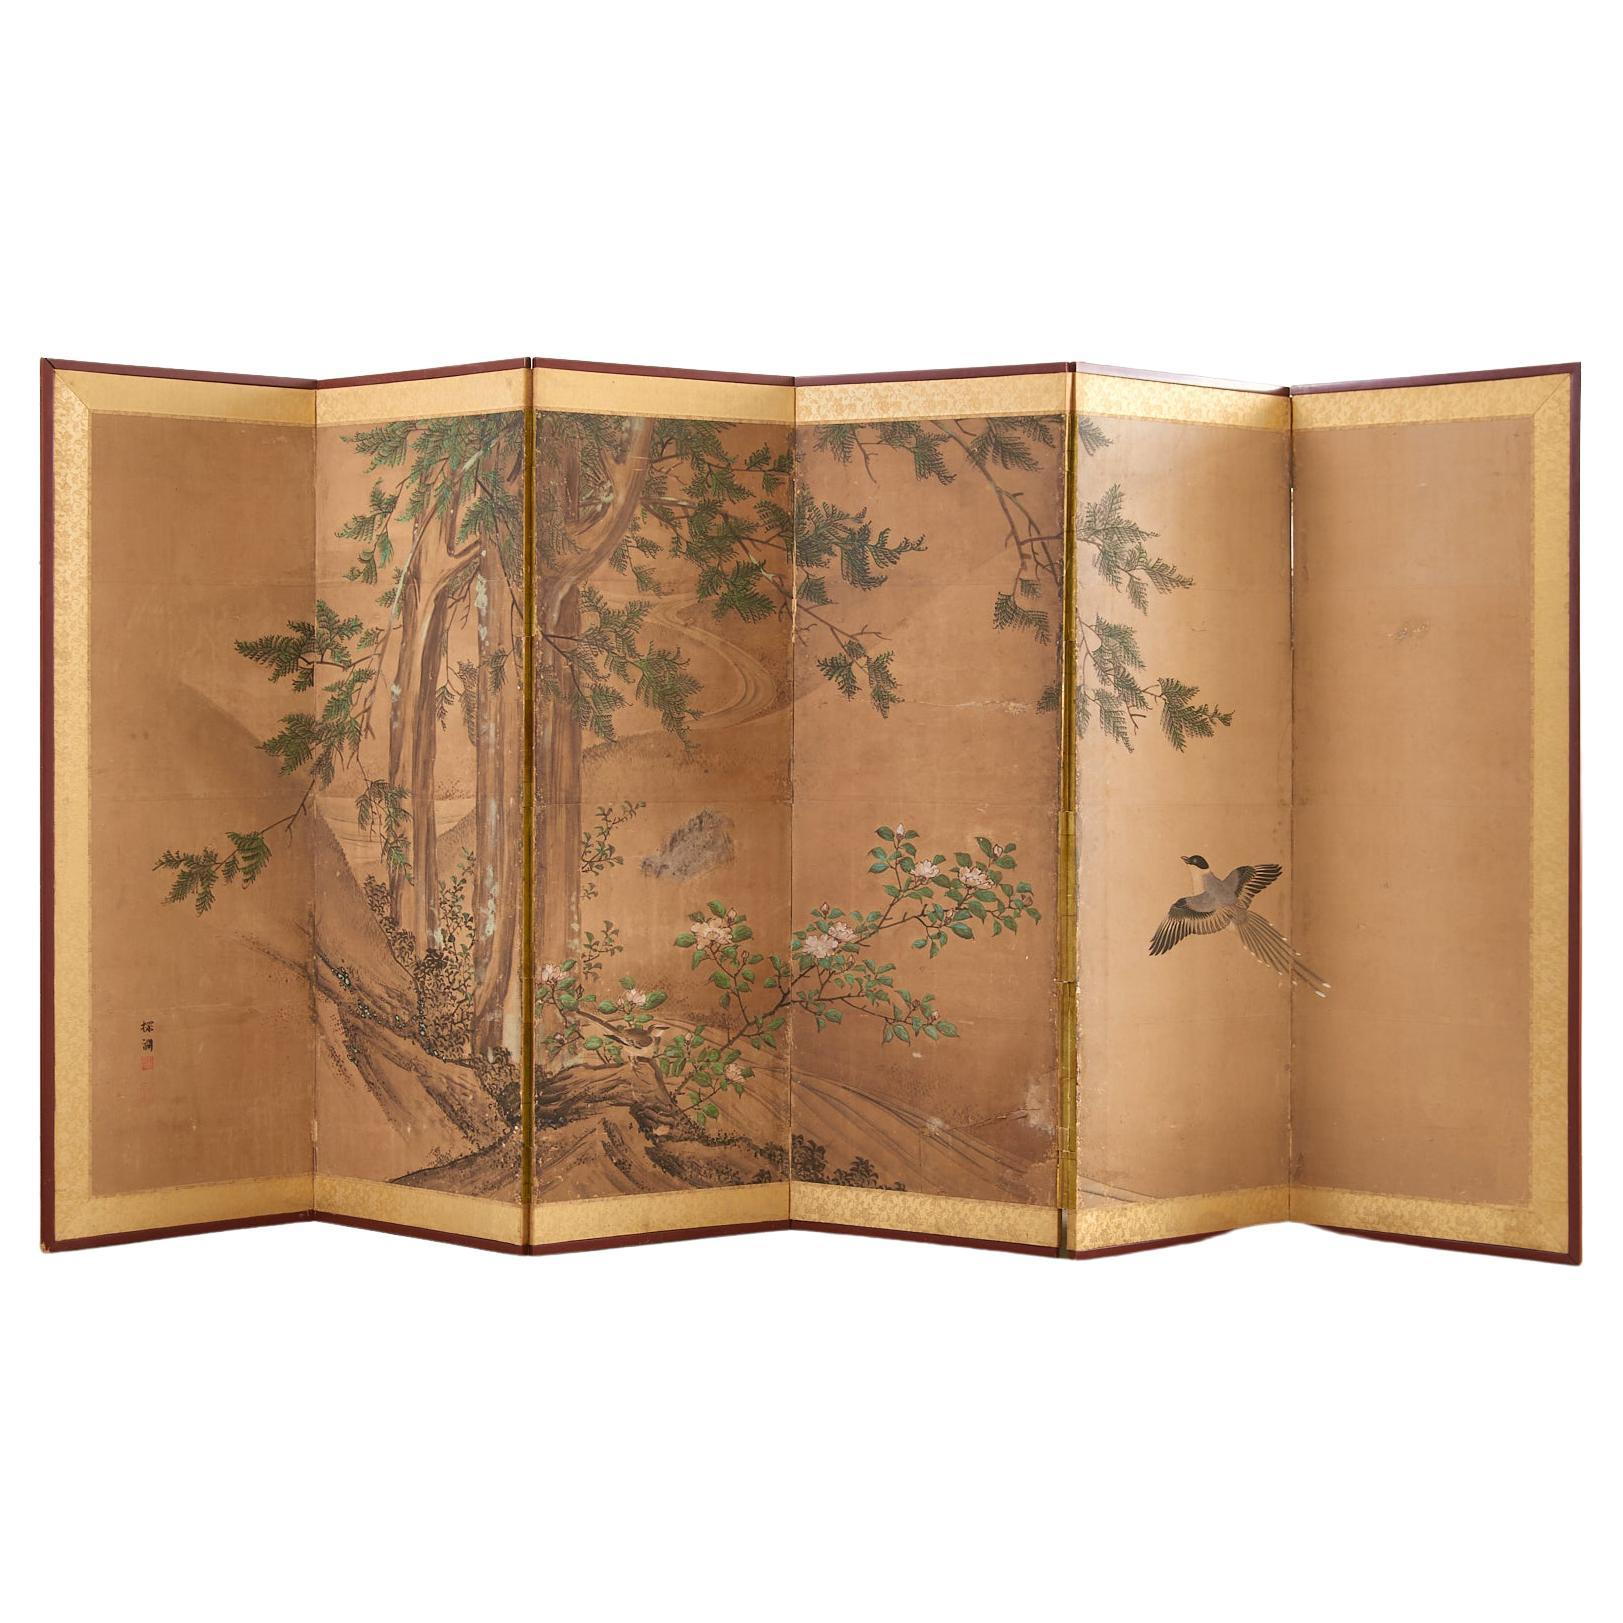 19th Century Japanese Edo Six Panel Kano School Landscape Screen